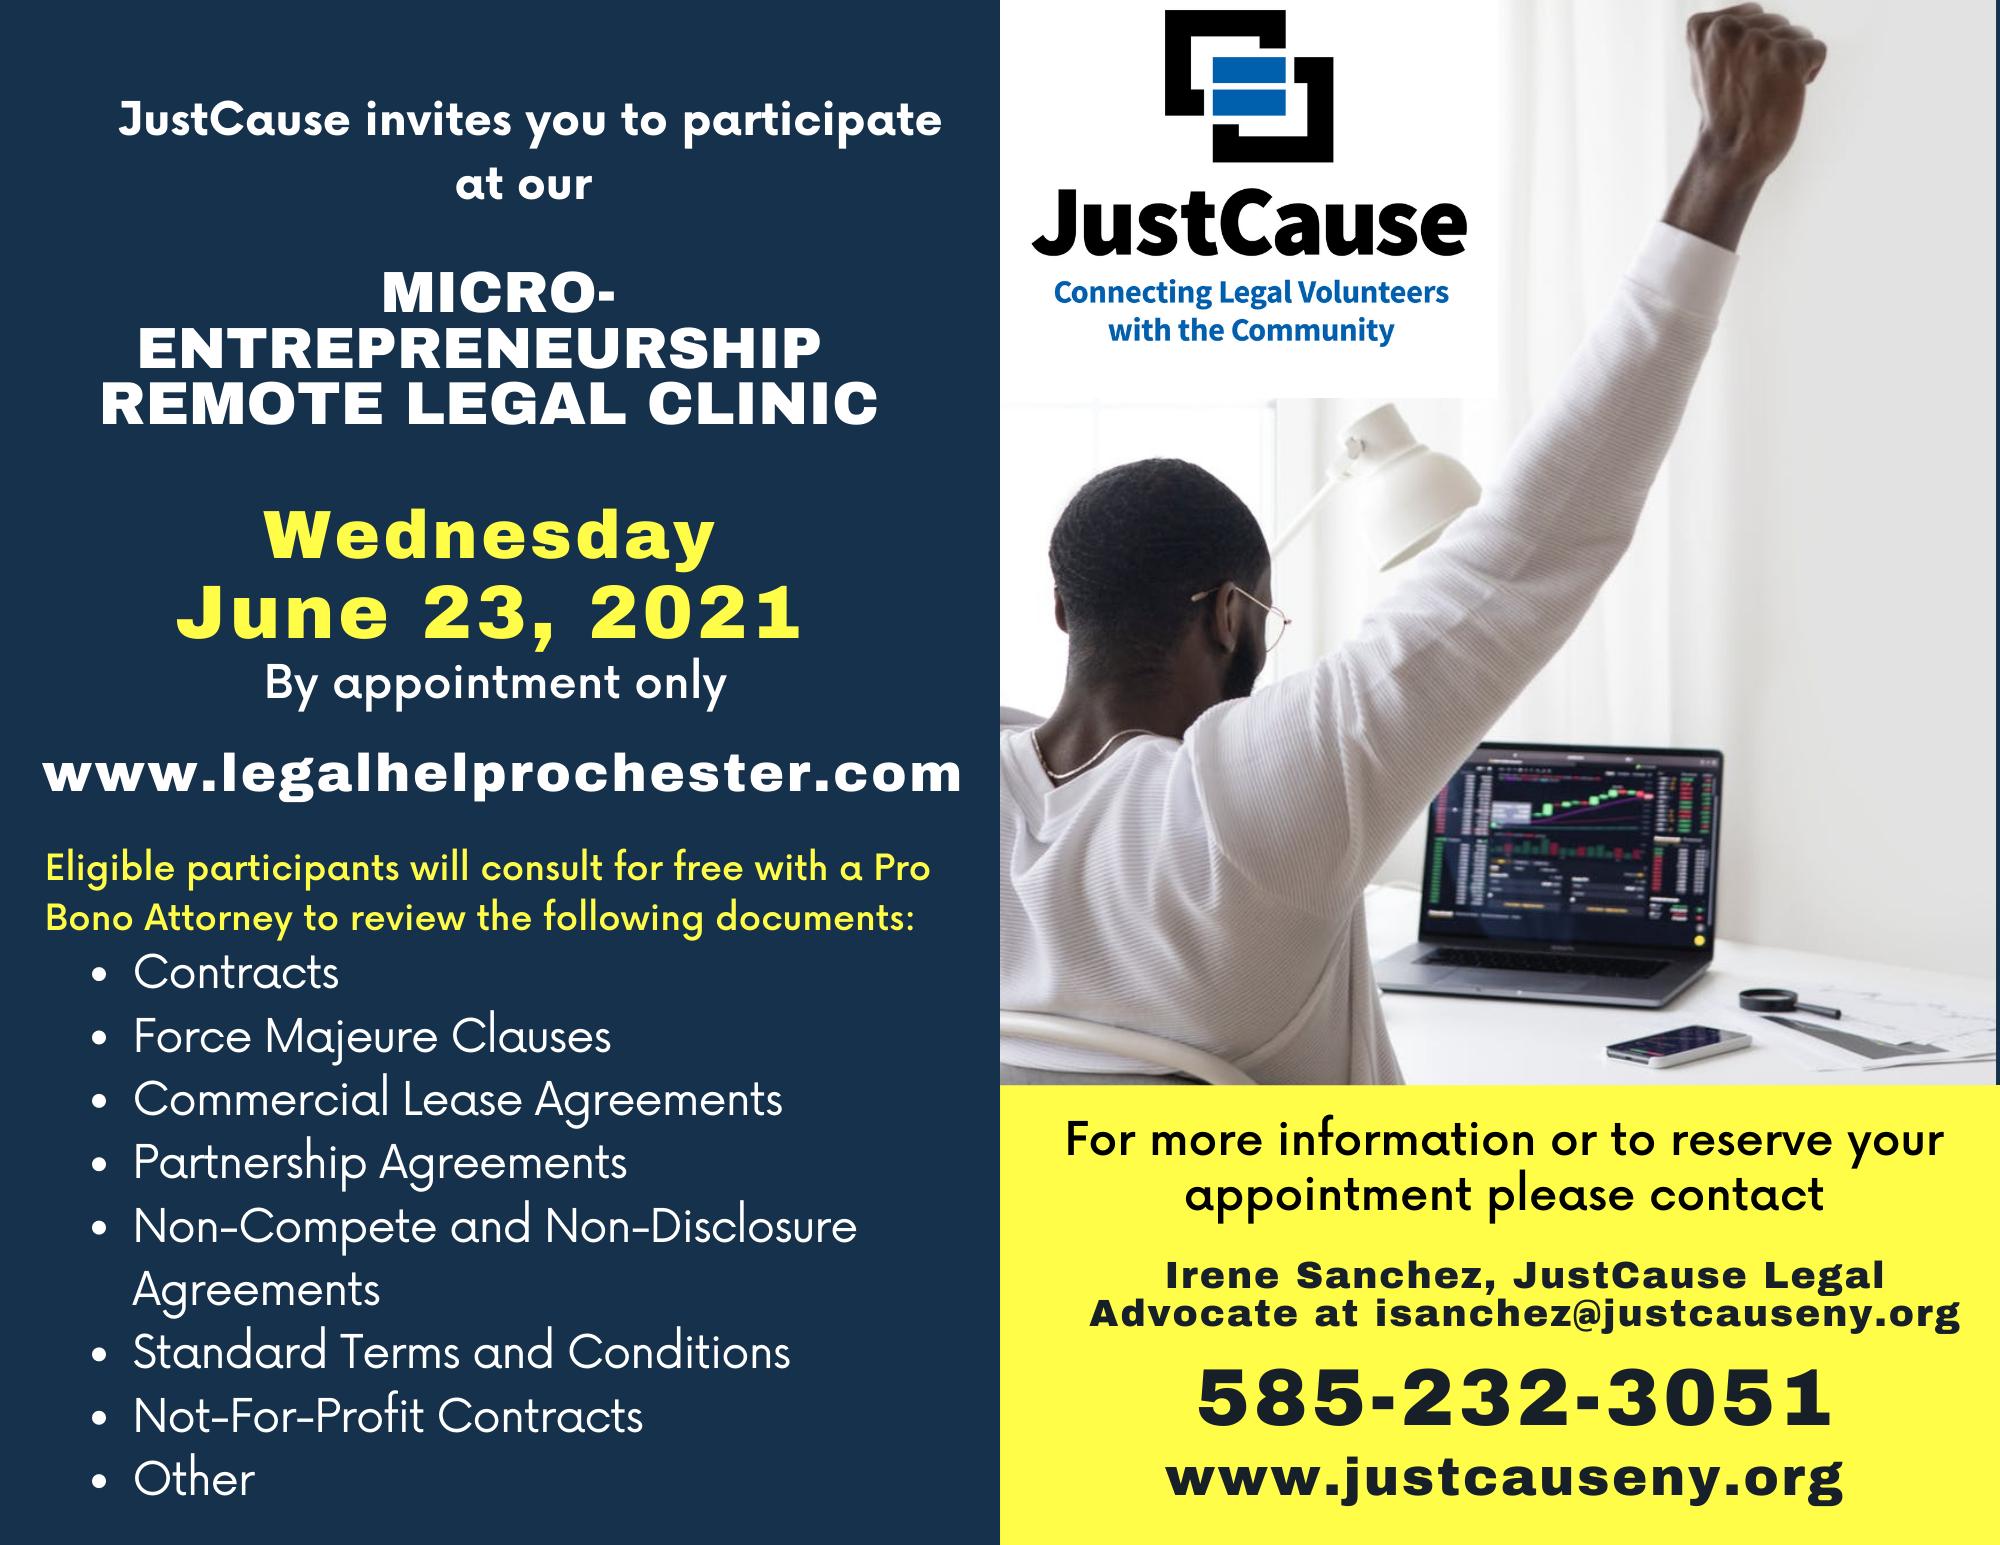 Micro-Entrepreneurship Remote Legal Clinic